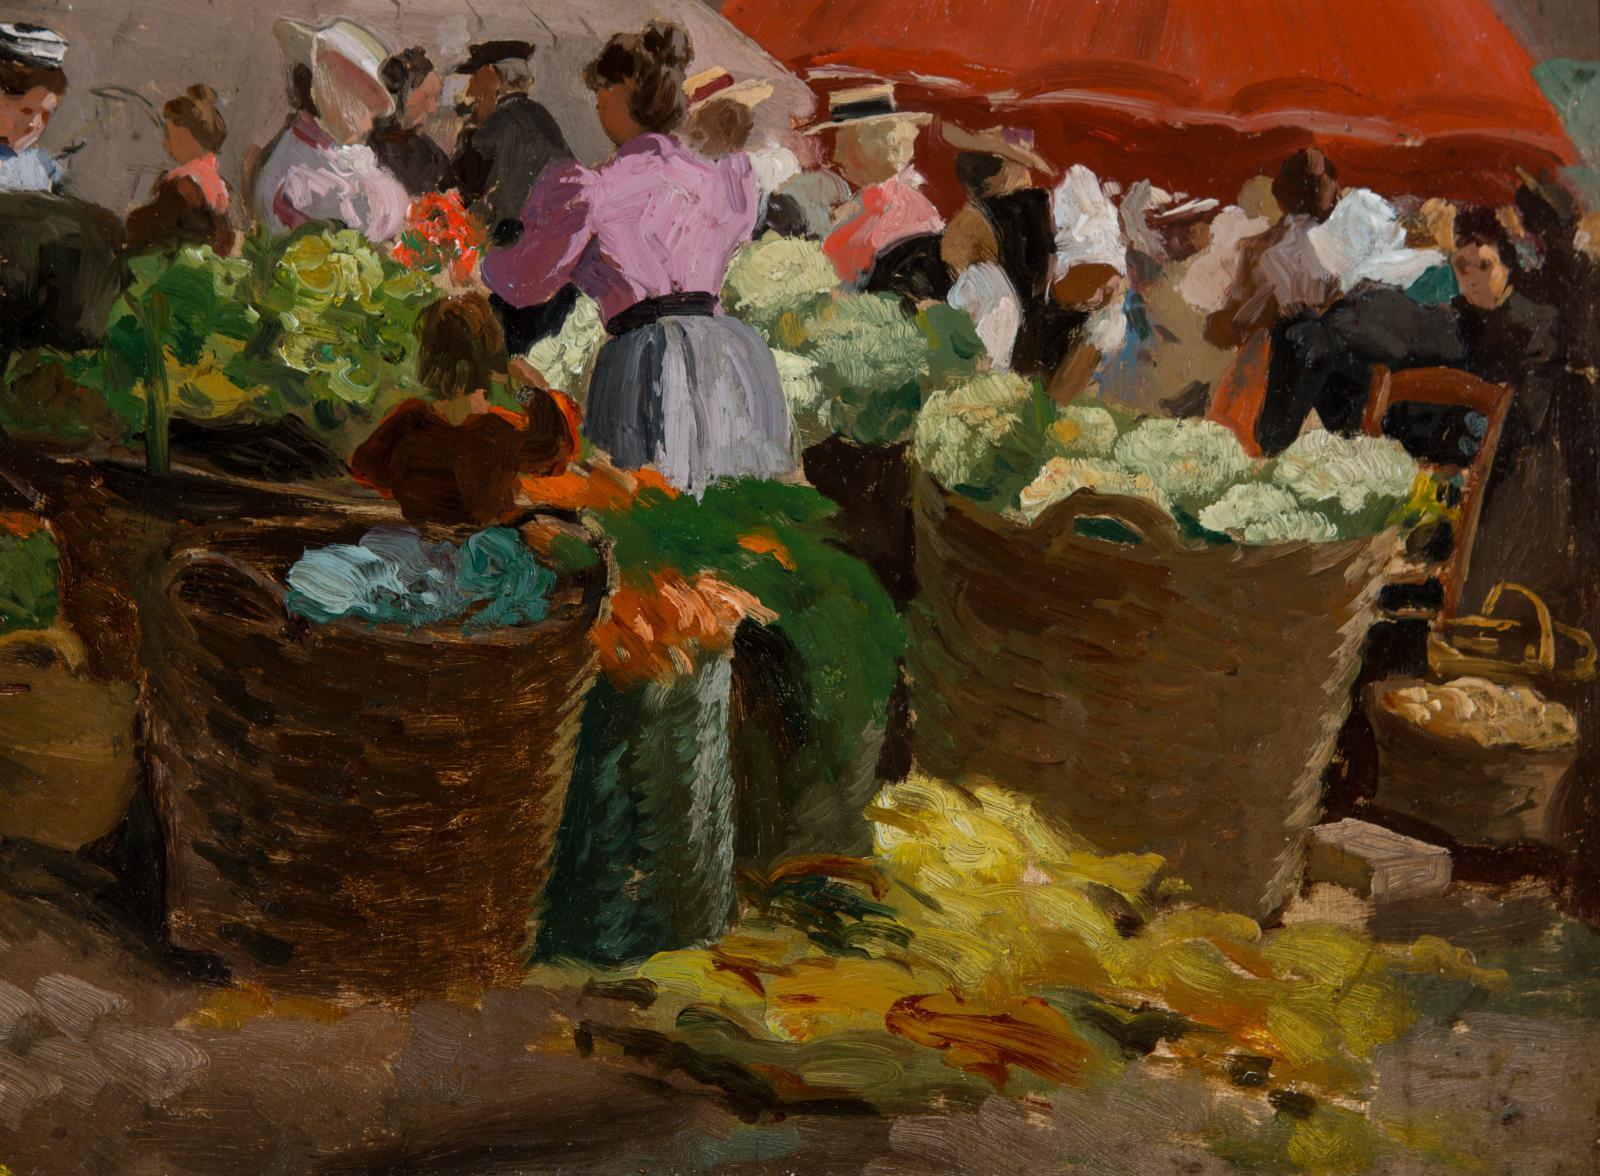 Large baskets full of fruit.